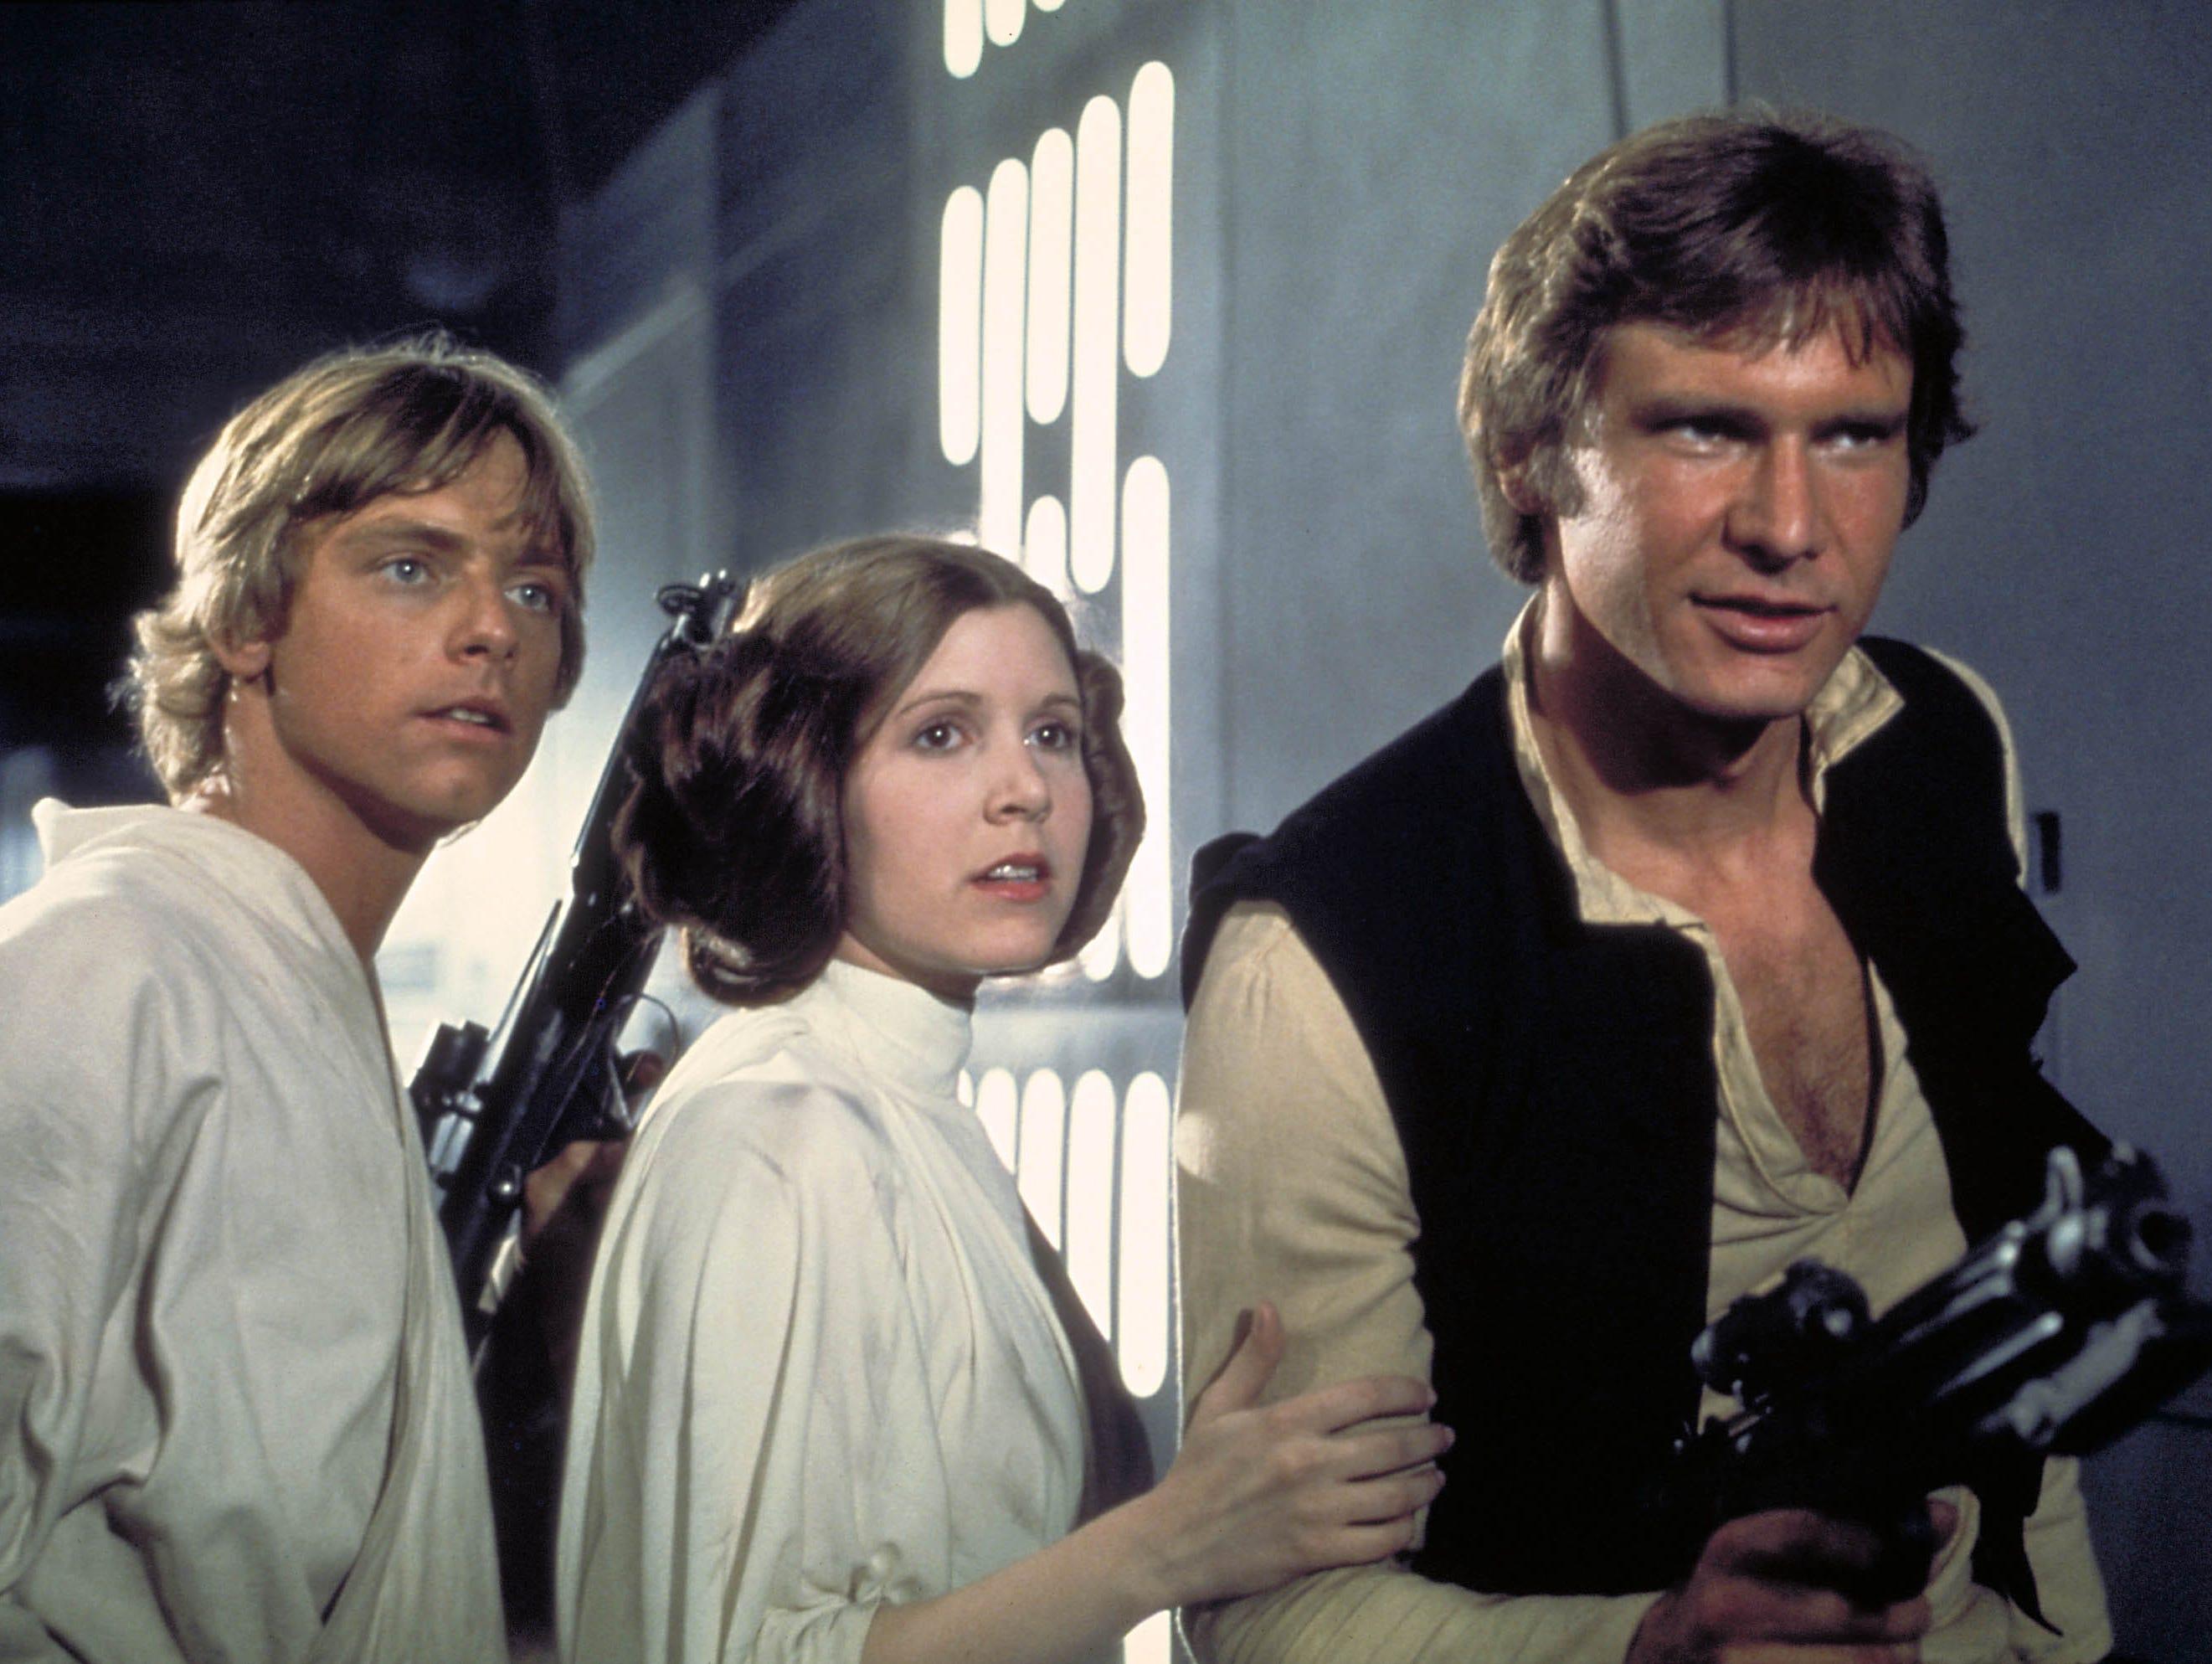 Star Wars quiz: Are you a Jedi, Sith or rebel?